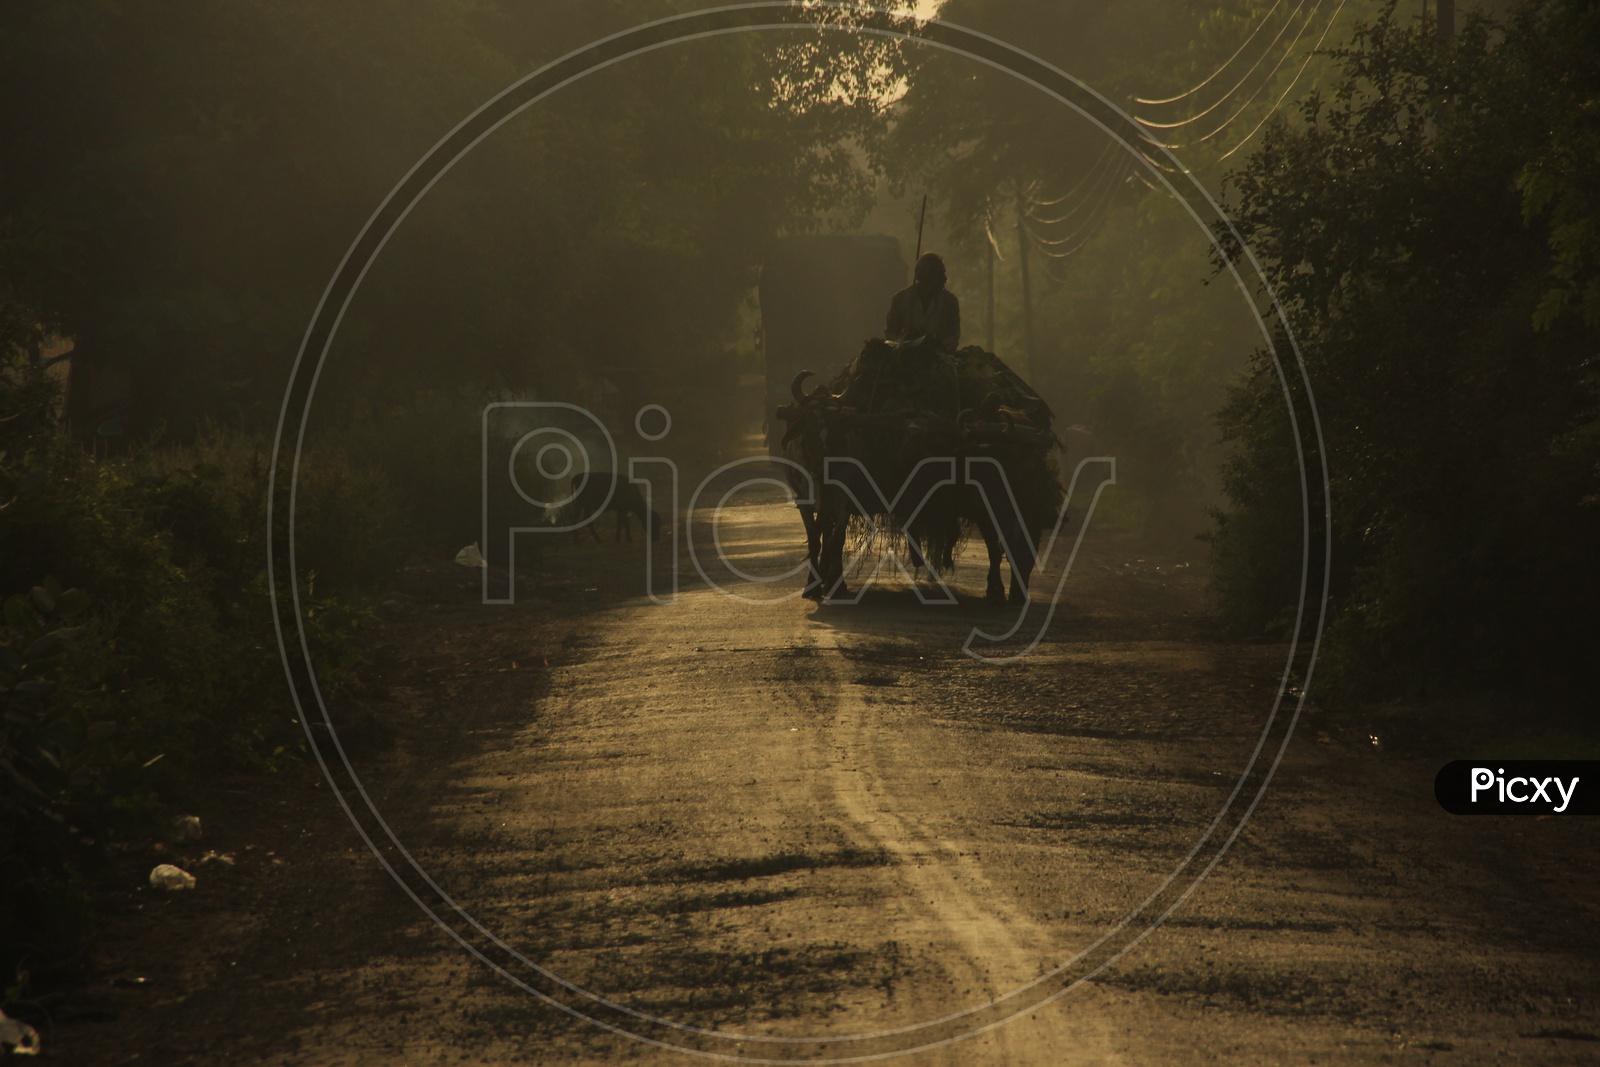 Farmer riding Bullock cart early in the morning